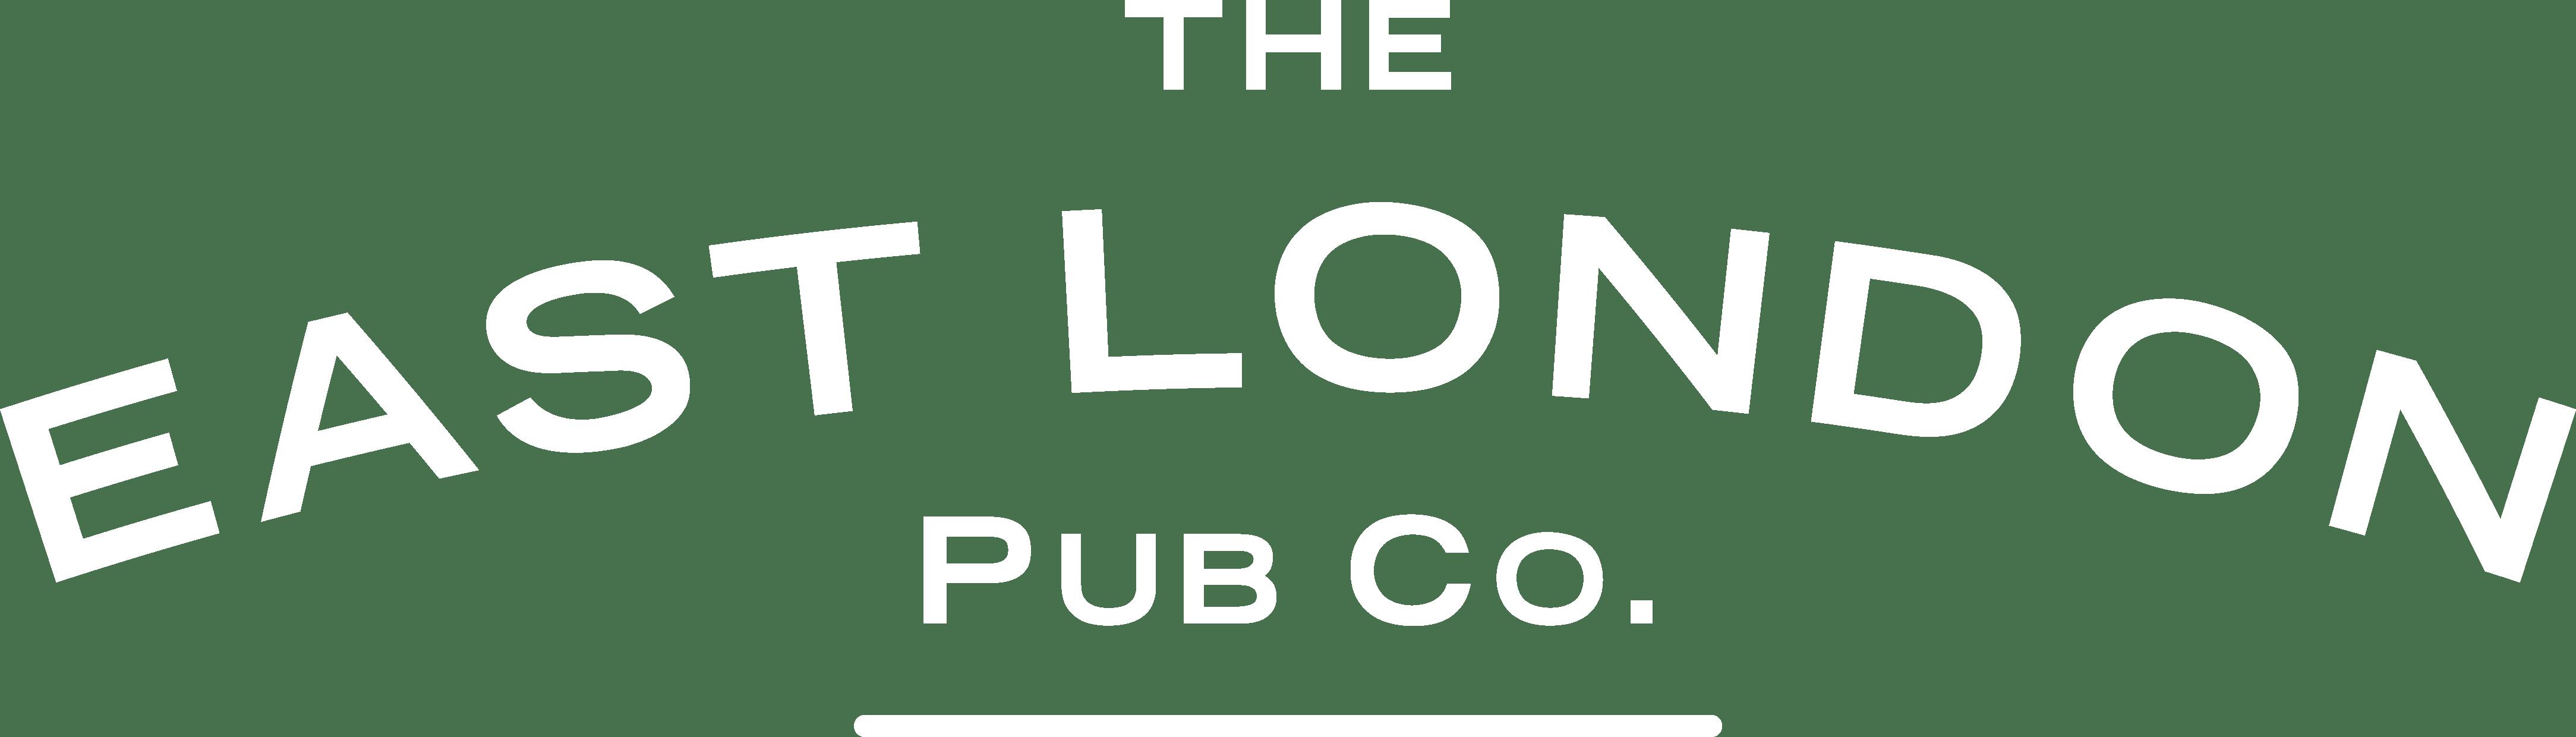 East London Pub Company Logo